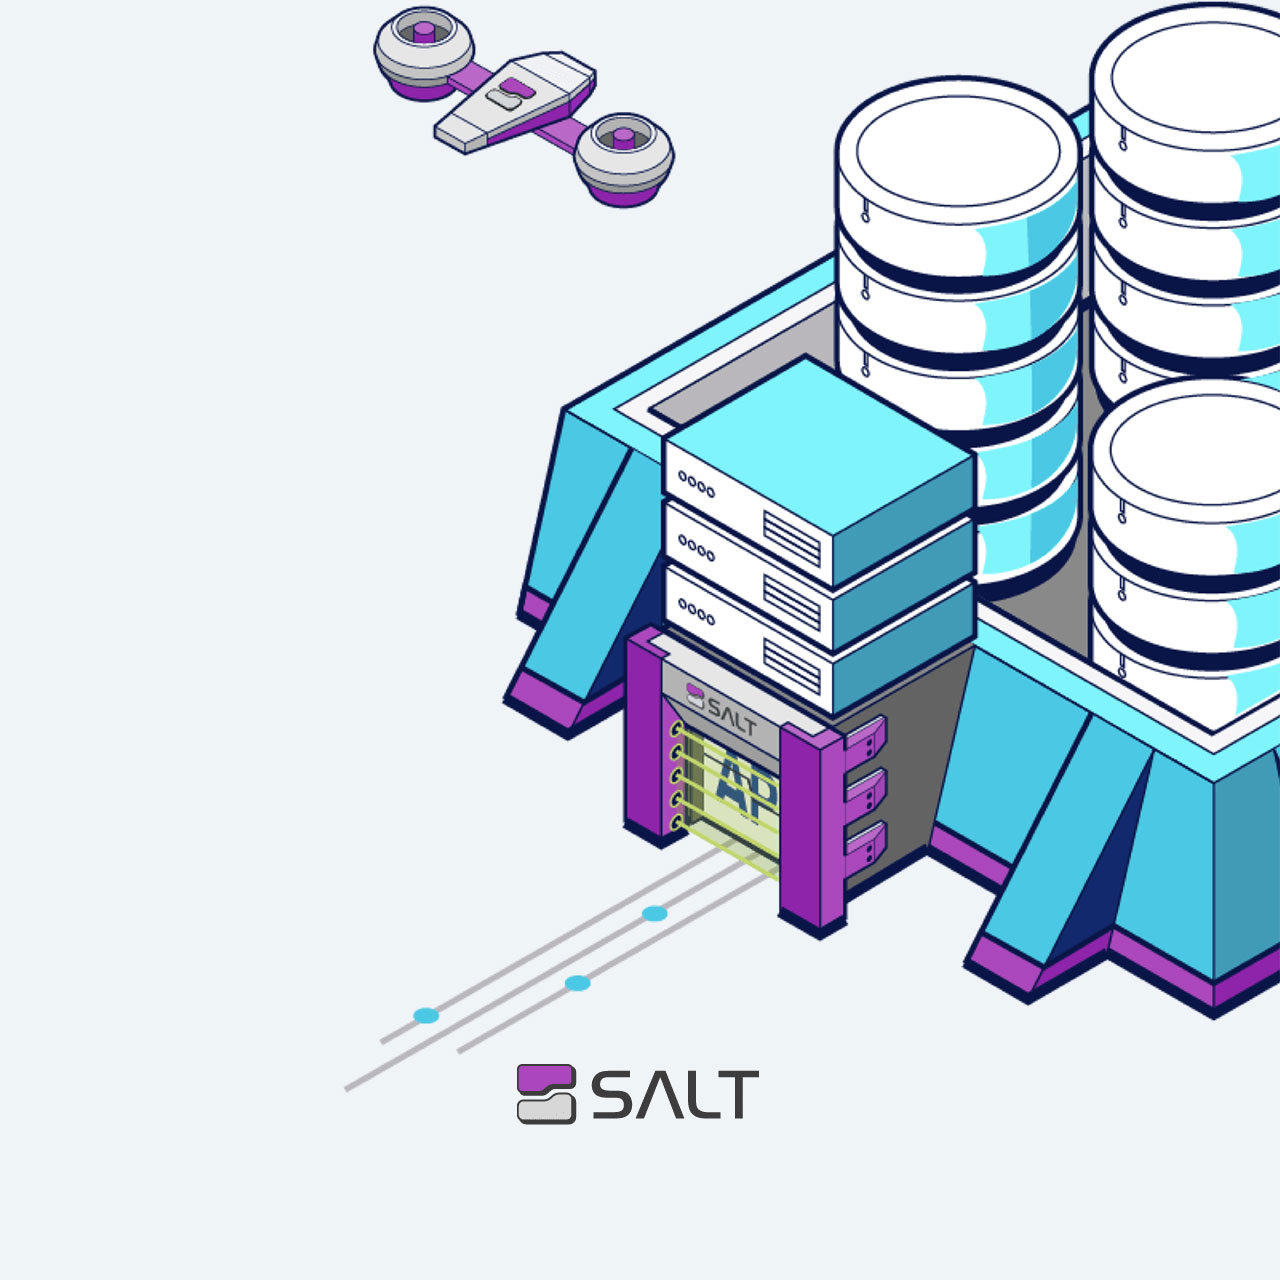 salt-feature-image